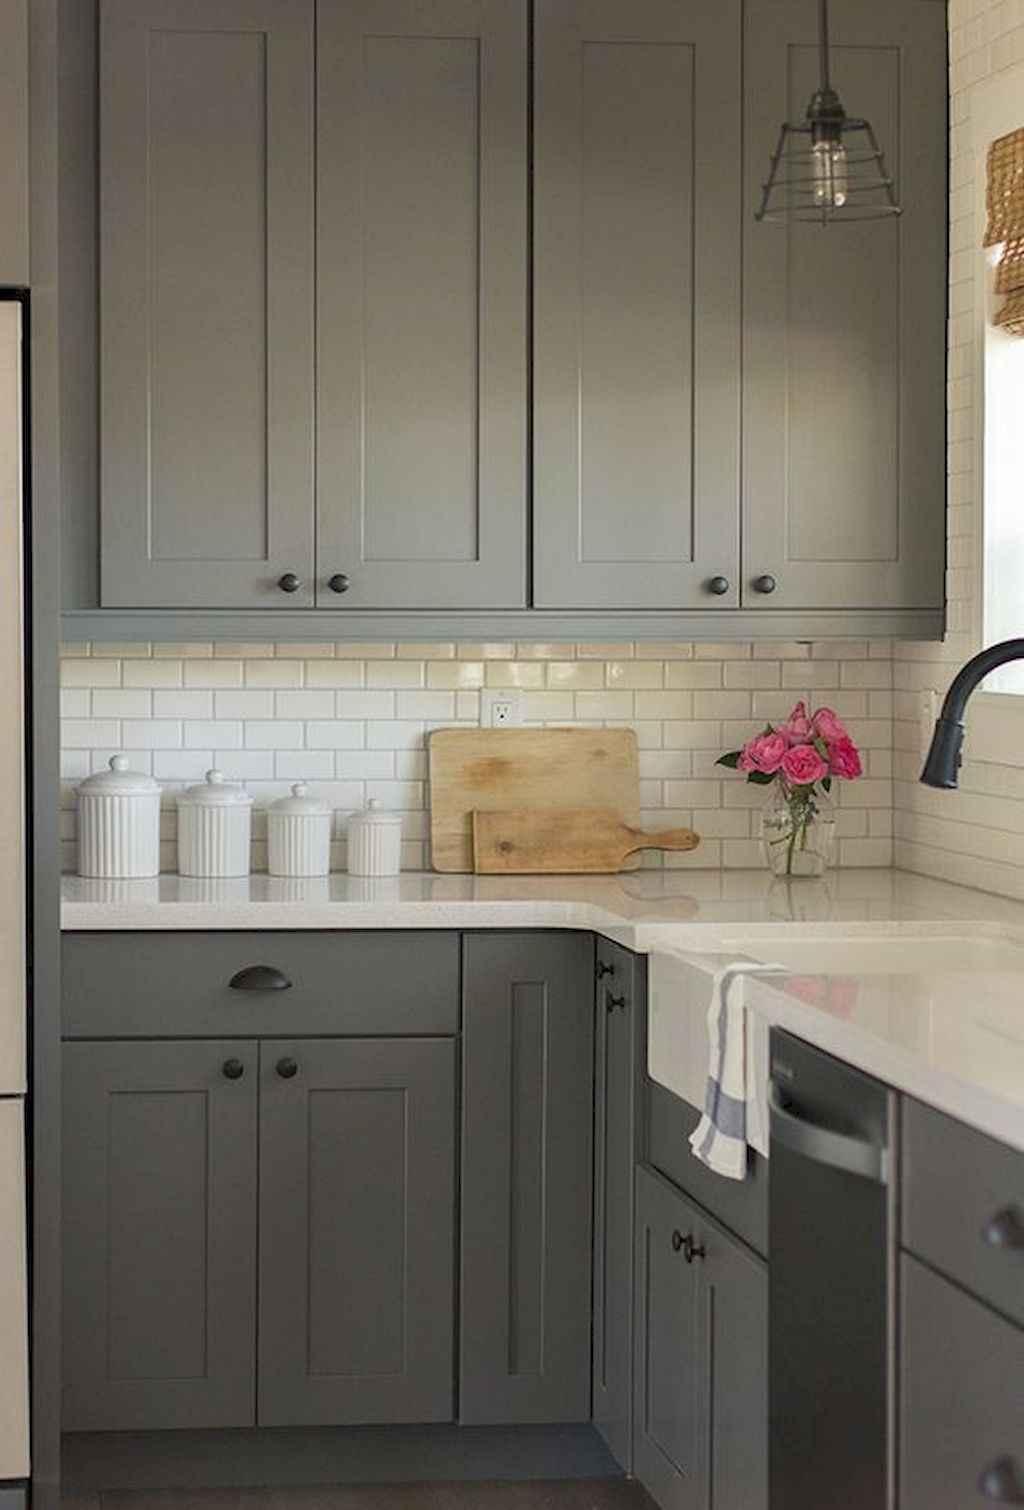 Gorgeous gray kitchen cabinet makeover ideas (23)